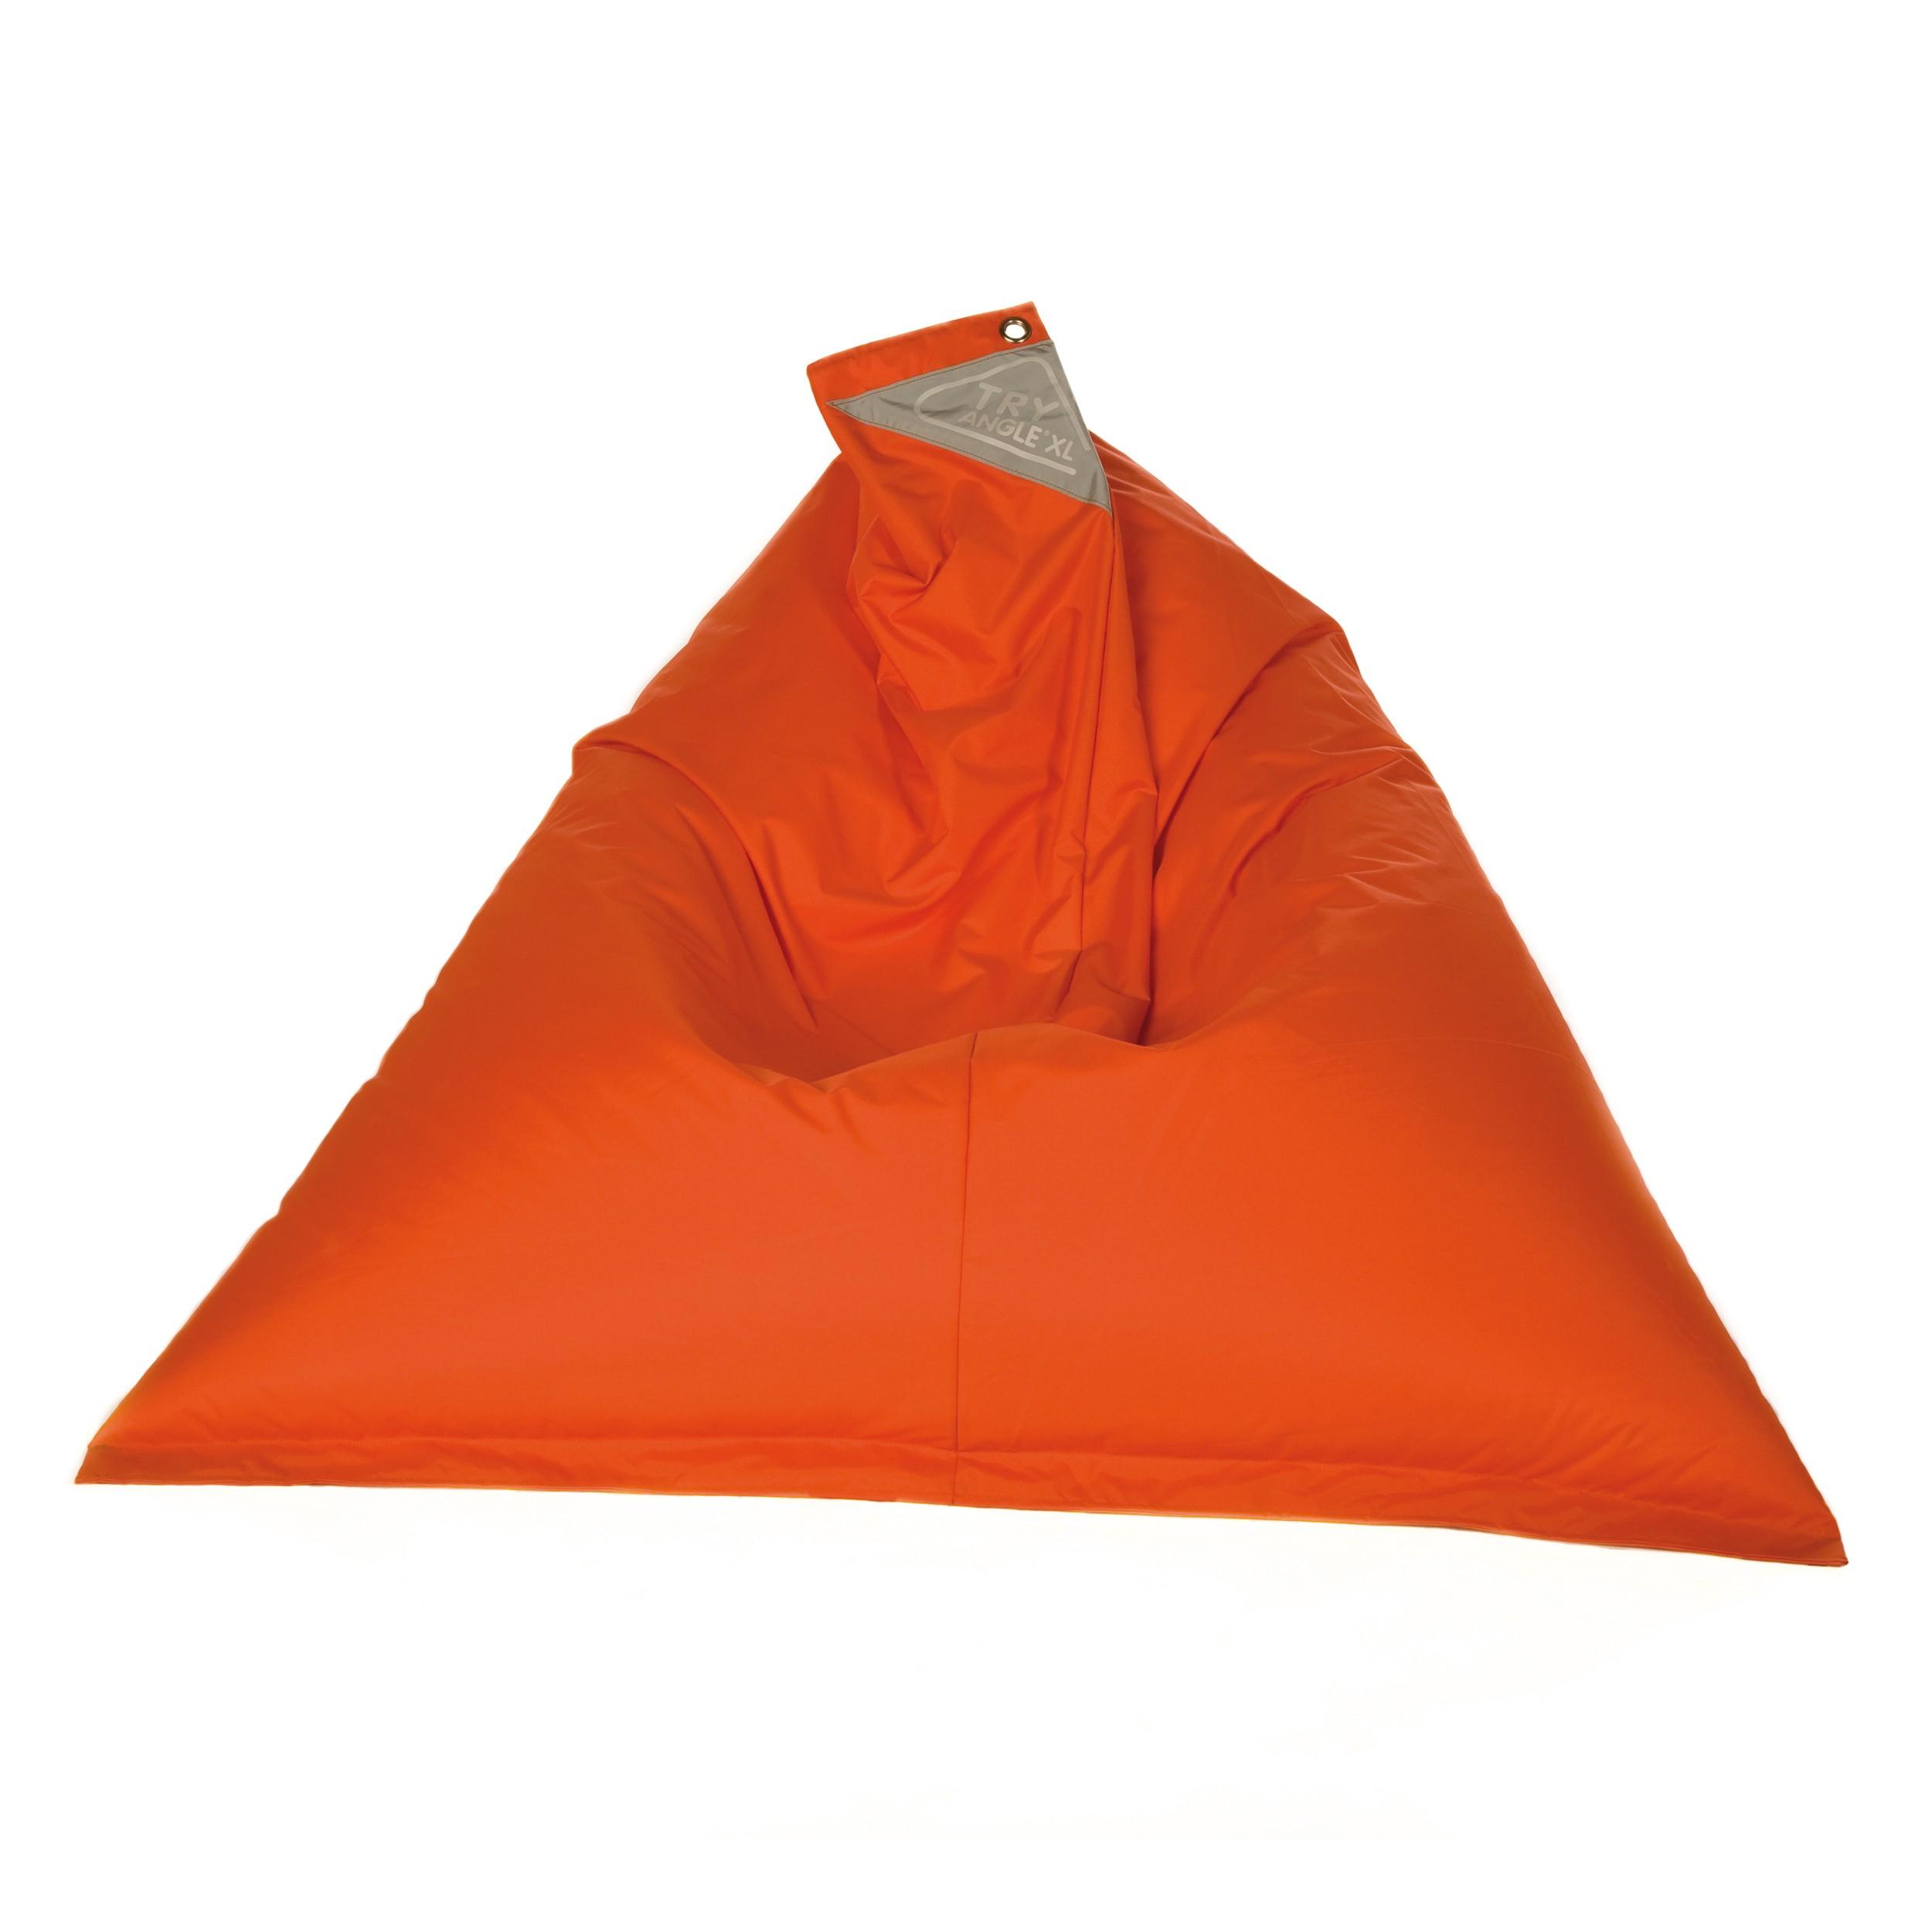 acheter pouf orange confortable